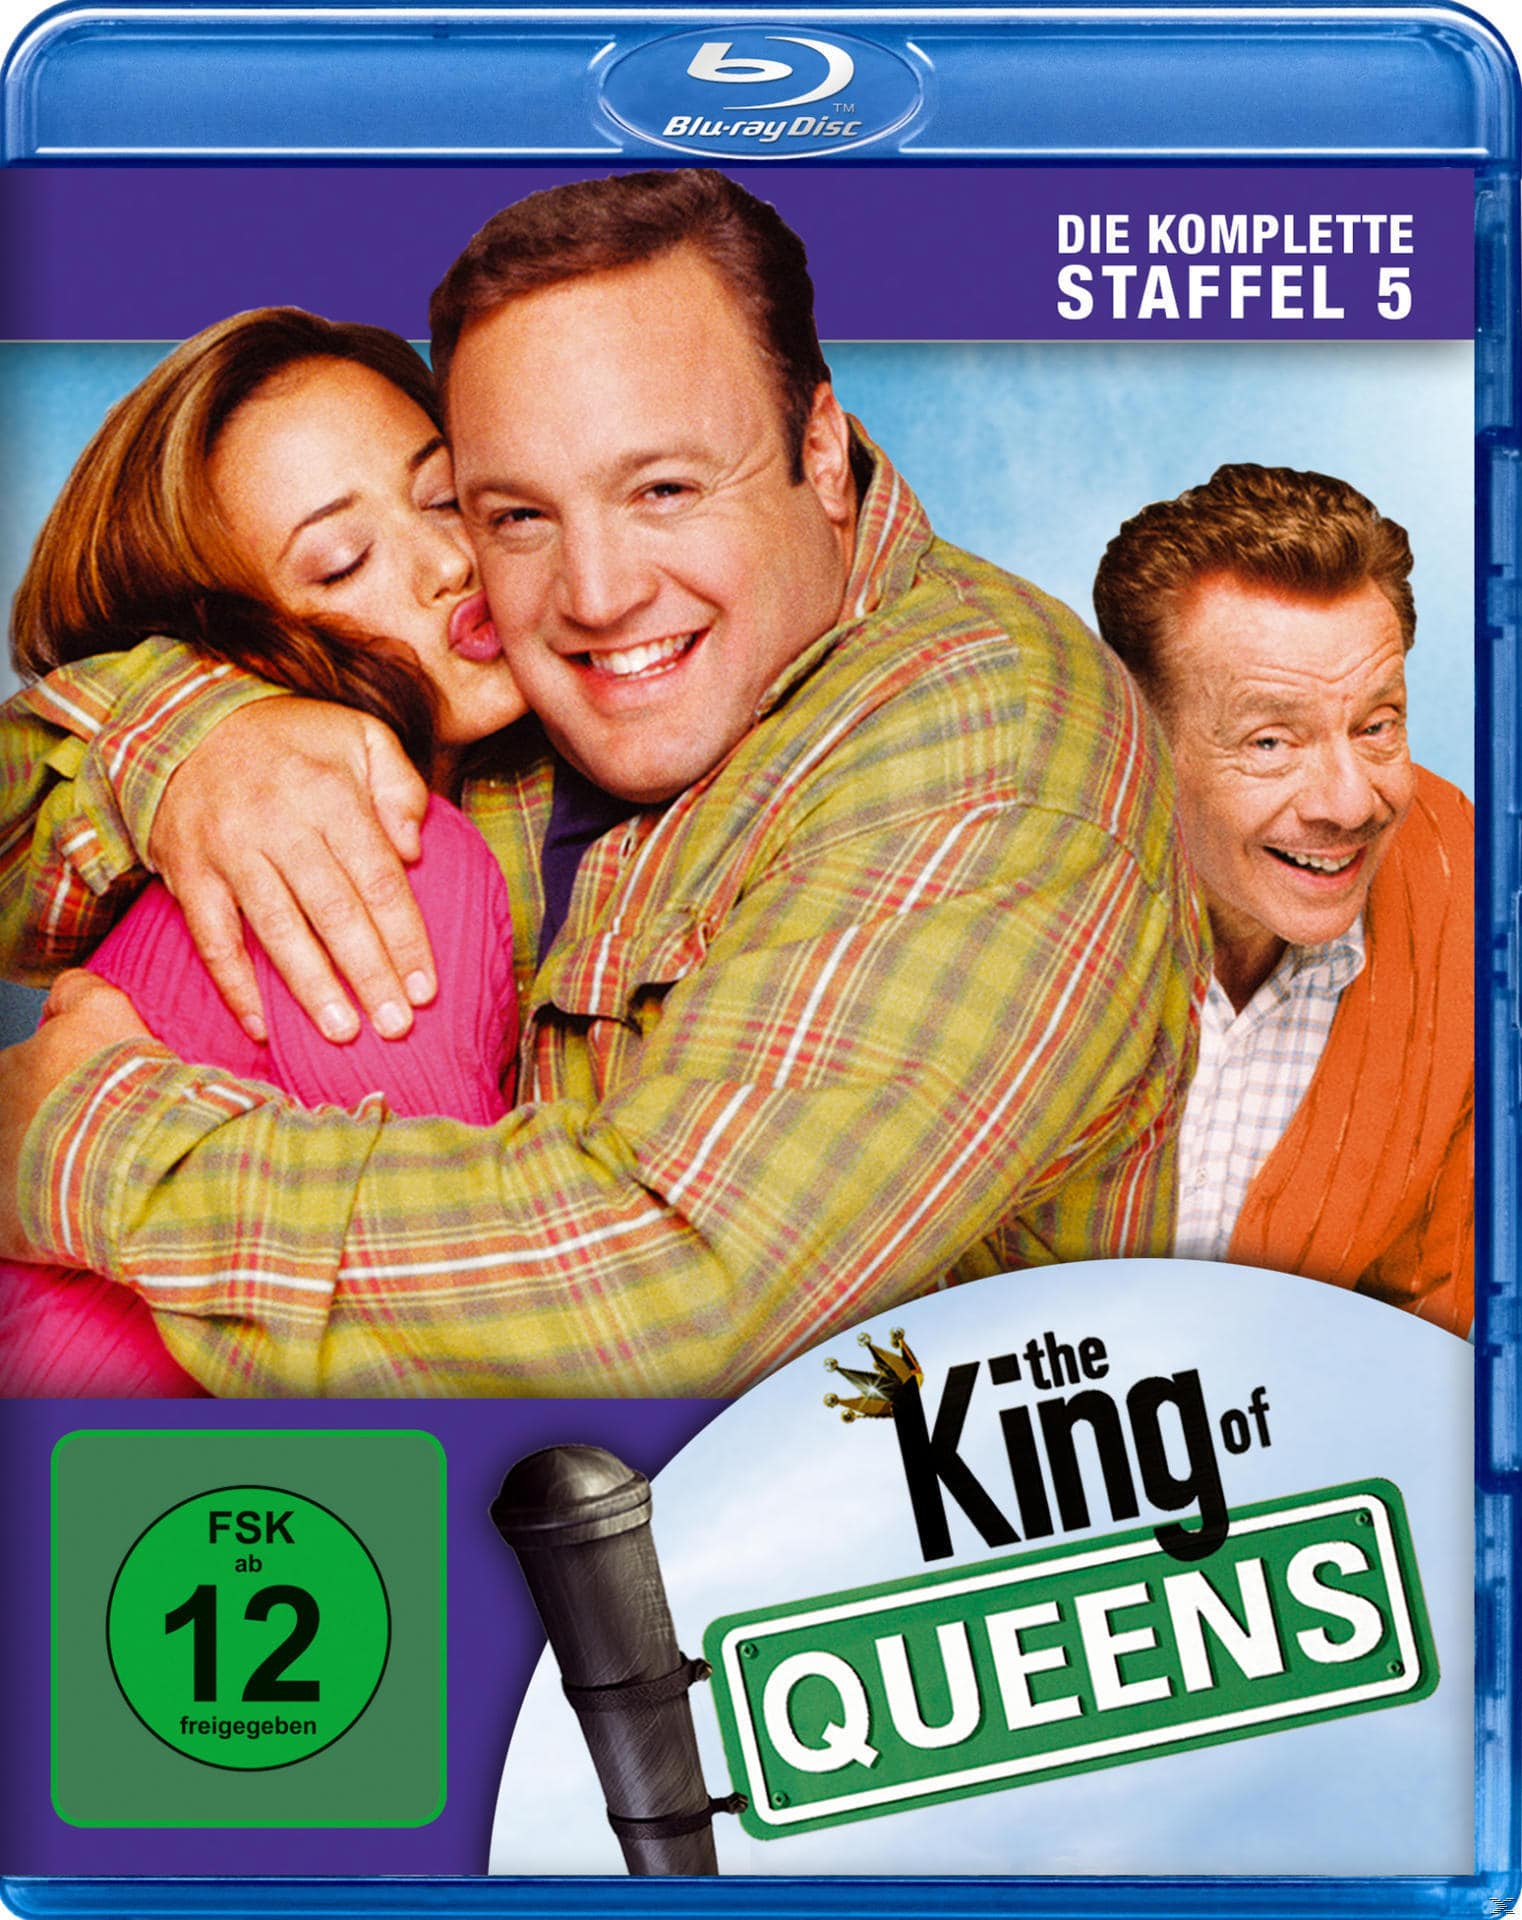 King of Queens - Season 5 - 2 Disc Bluray (BLU-RAY) für 9,99 Euro